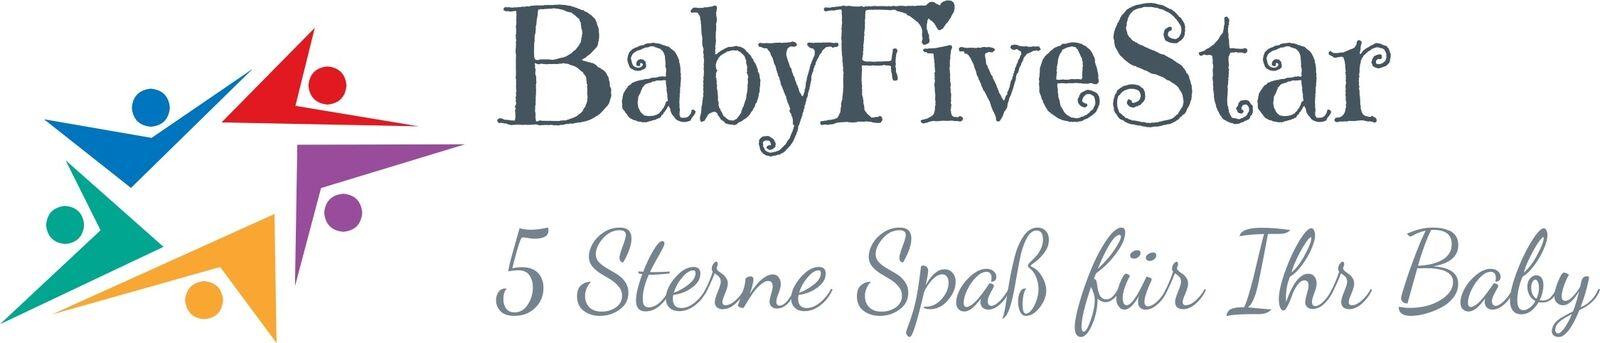 BabyFiveStar-Shop